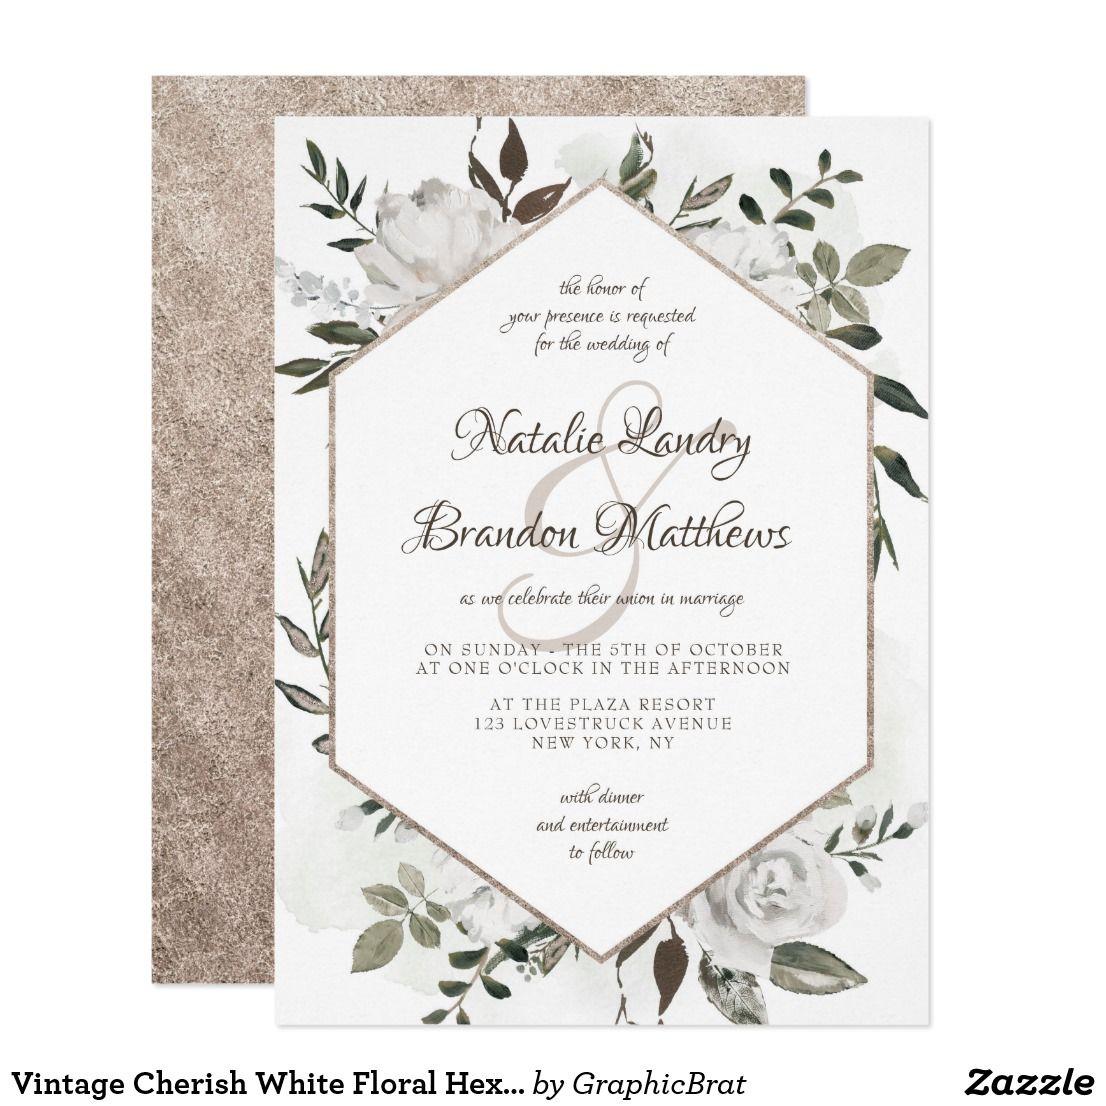 Zazzle Wedding Invitations.Vintage Cherish White Floral Hexagon Wedding Invitation Zazzle Com